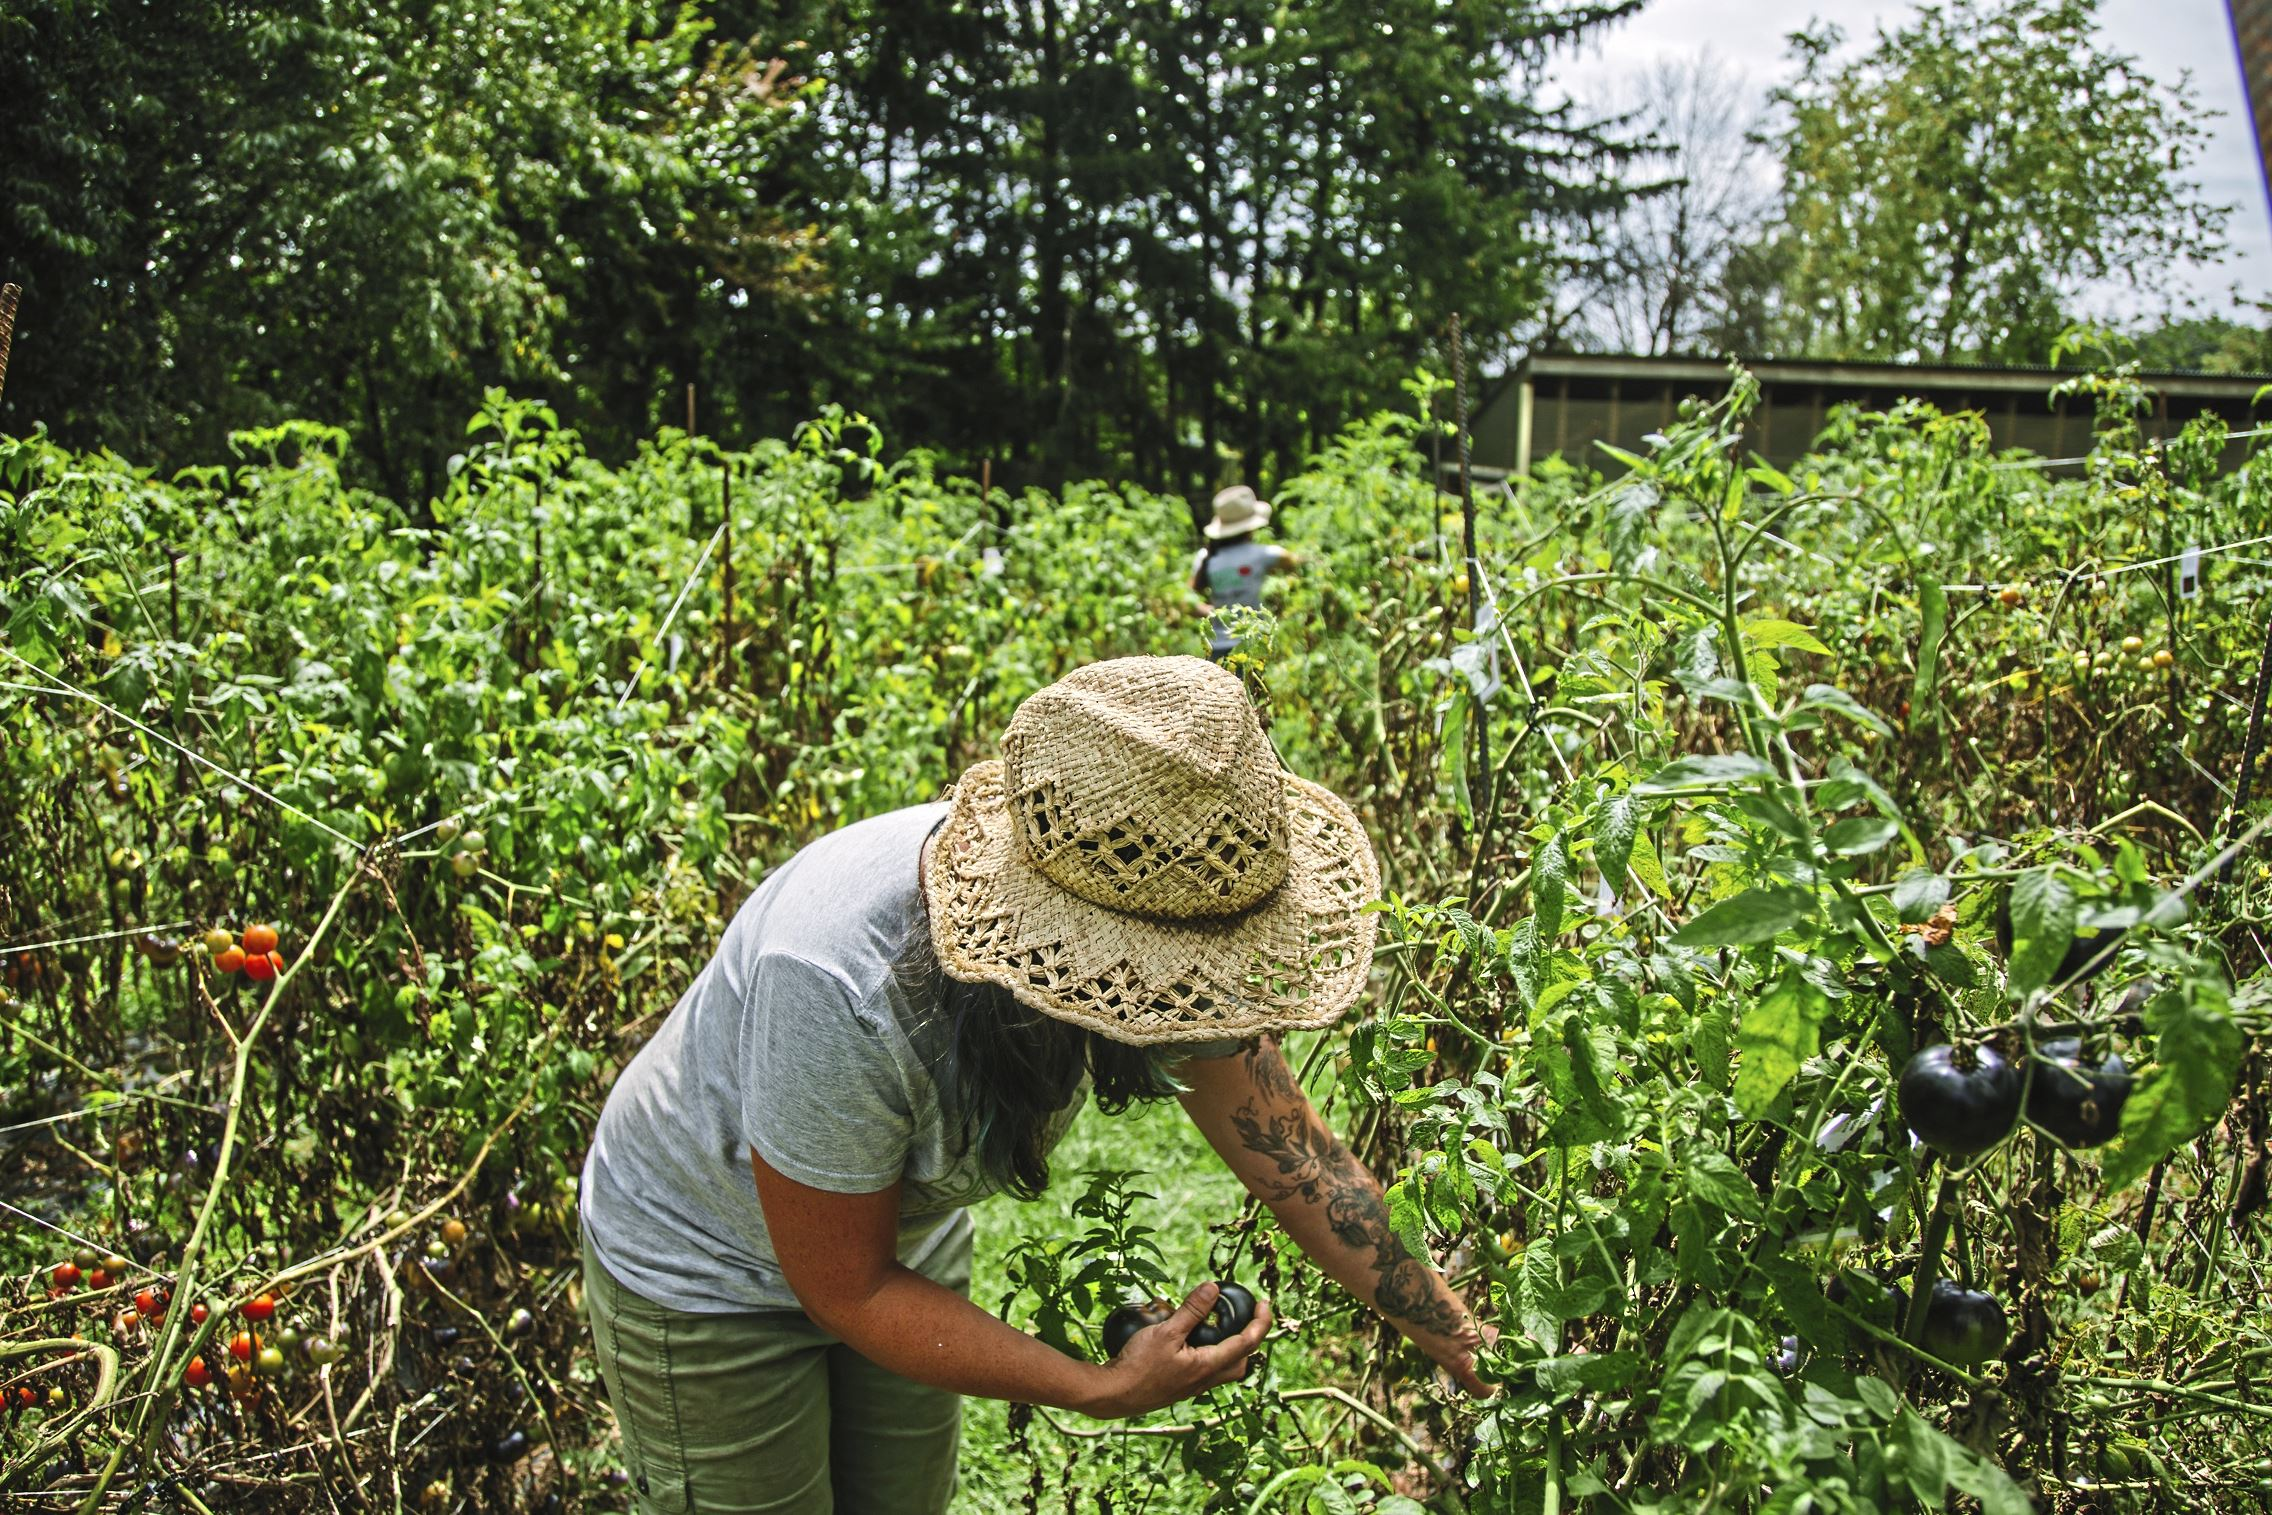 20170830arChurchviewFarm04-3 Tara Rockacy, owner of Churchview Farm, picks tomatoes at the farm.